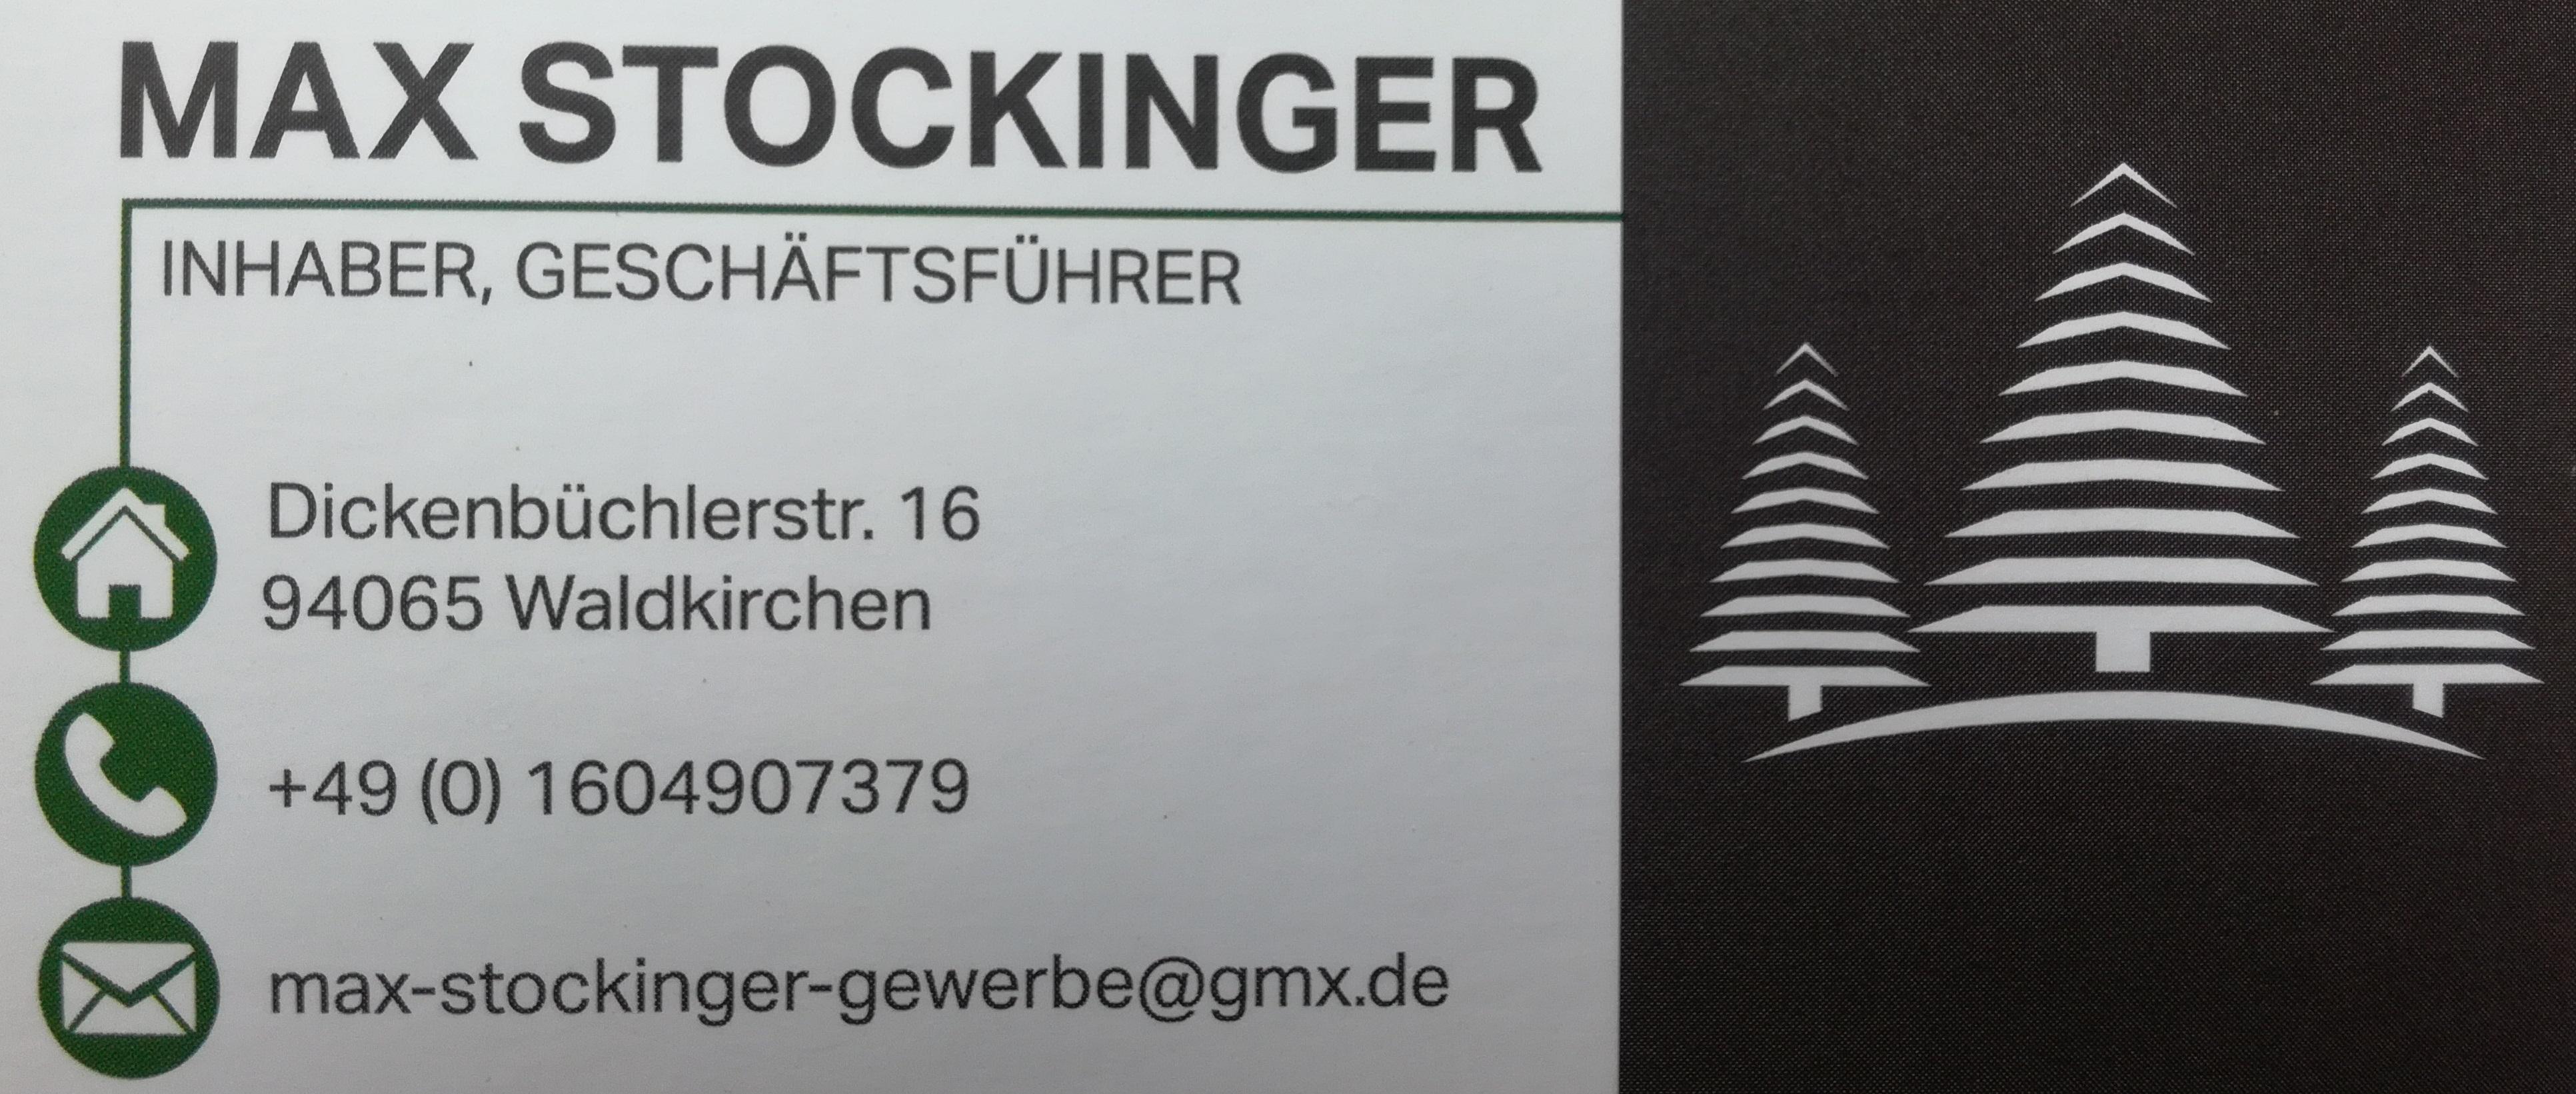 StockingerMax